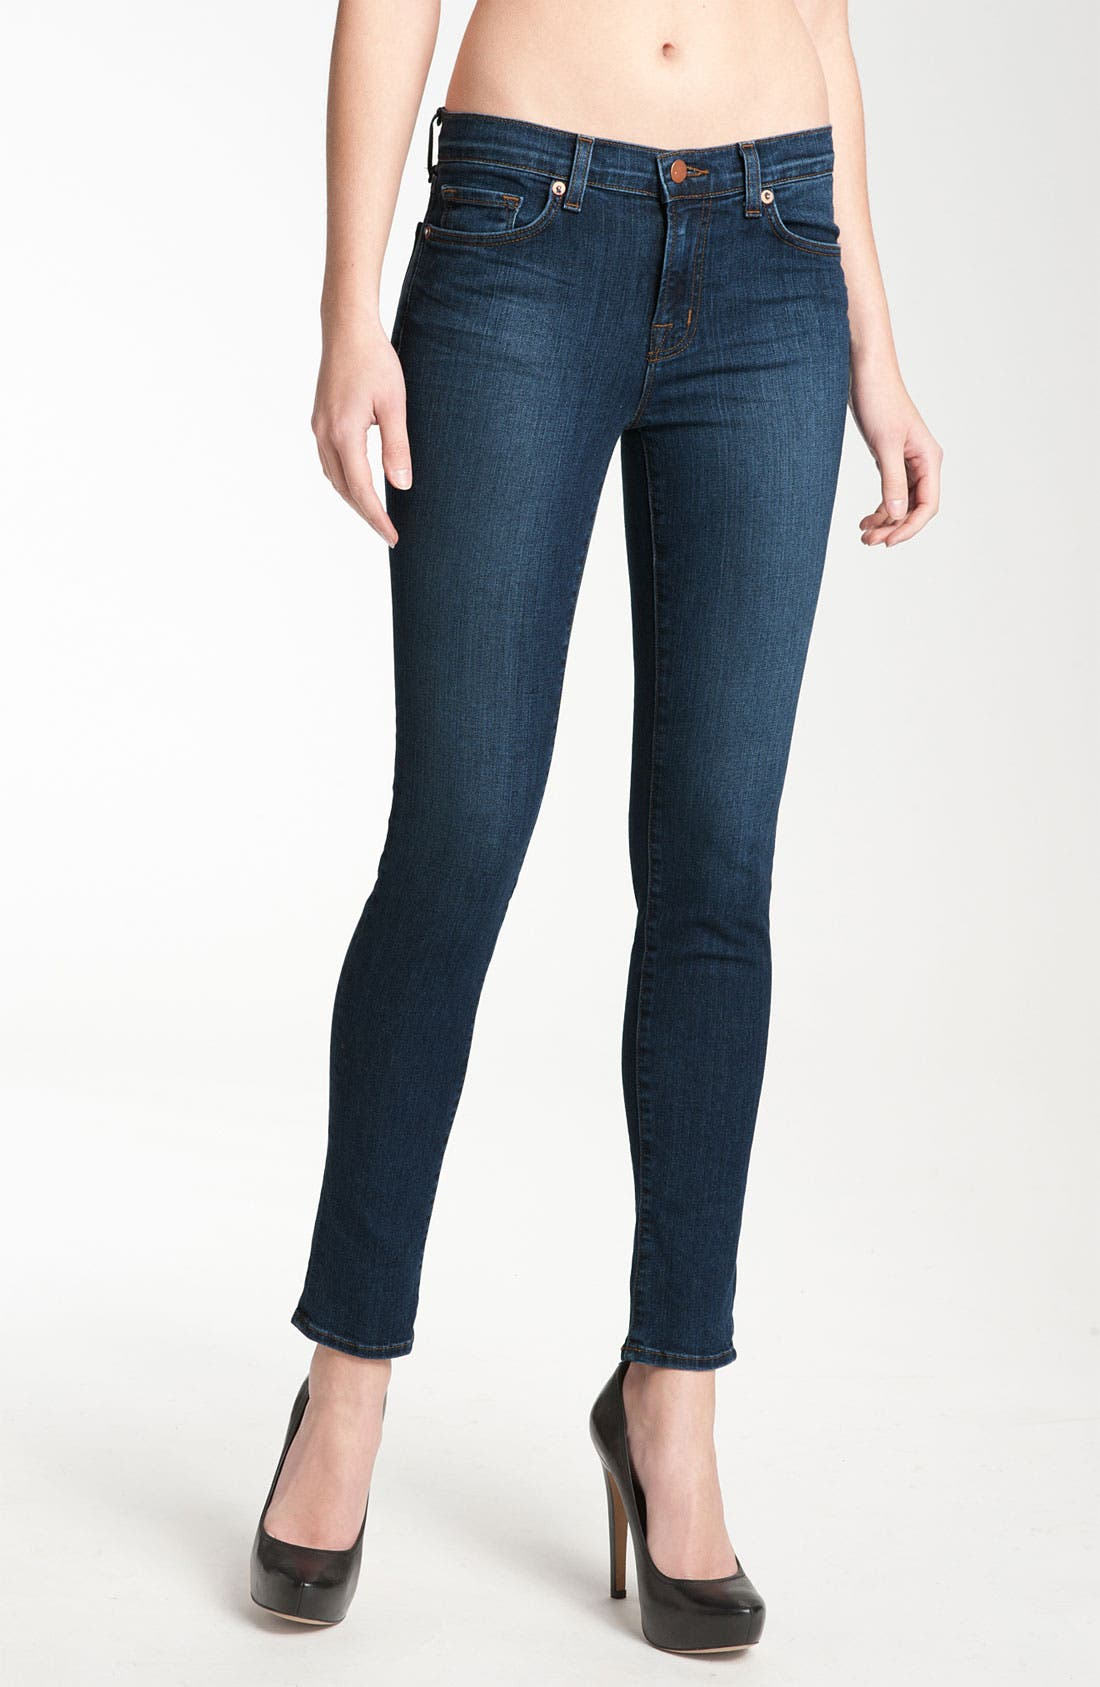 Main Image - J Brand '811' Skinny Stretch Jeans (Vivid)